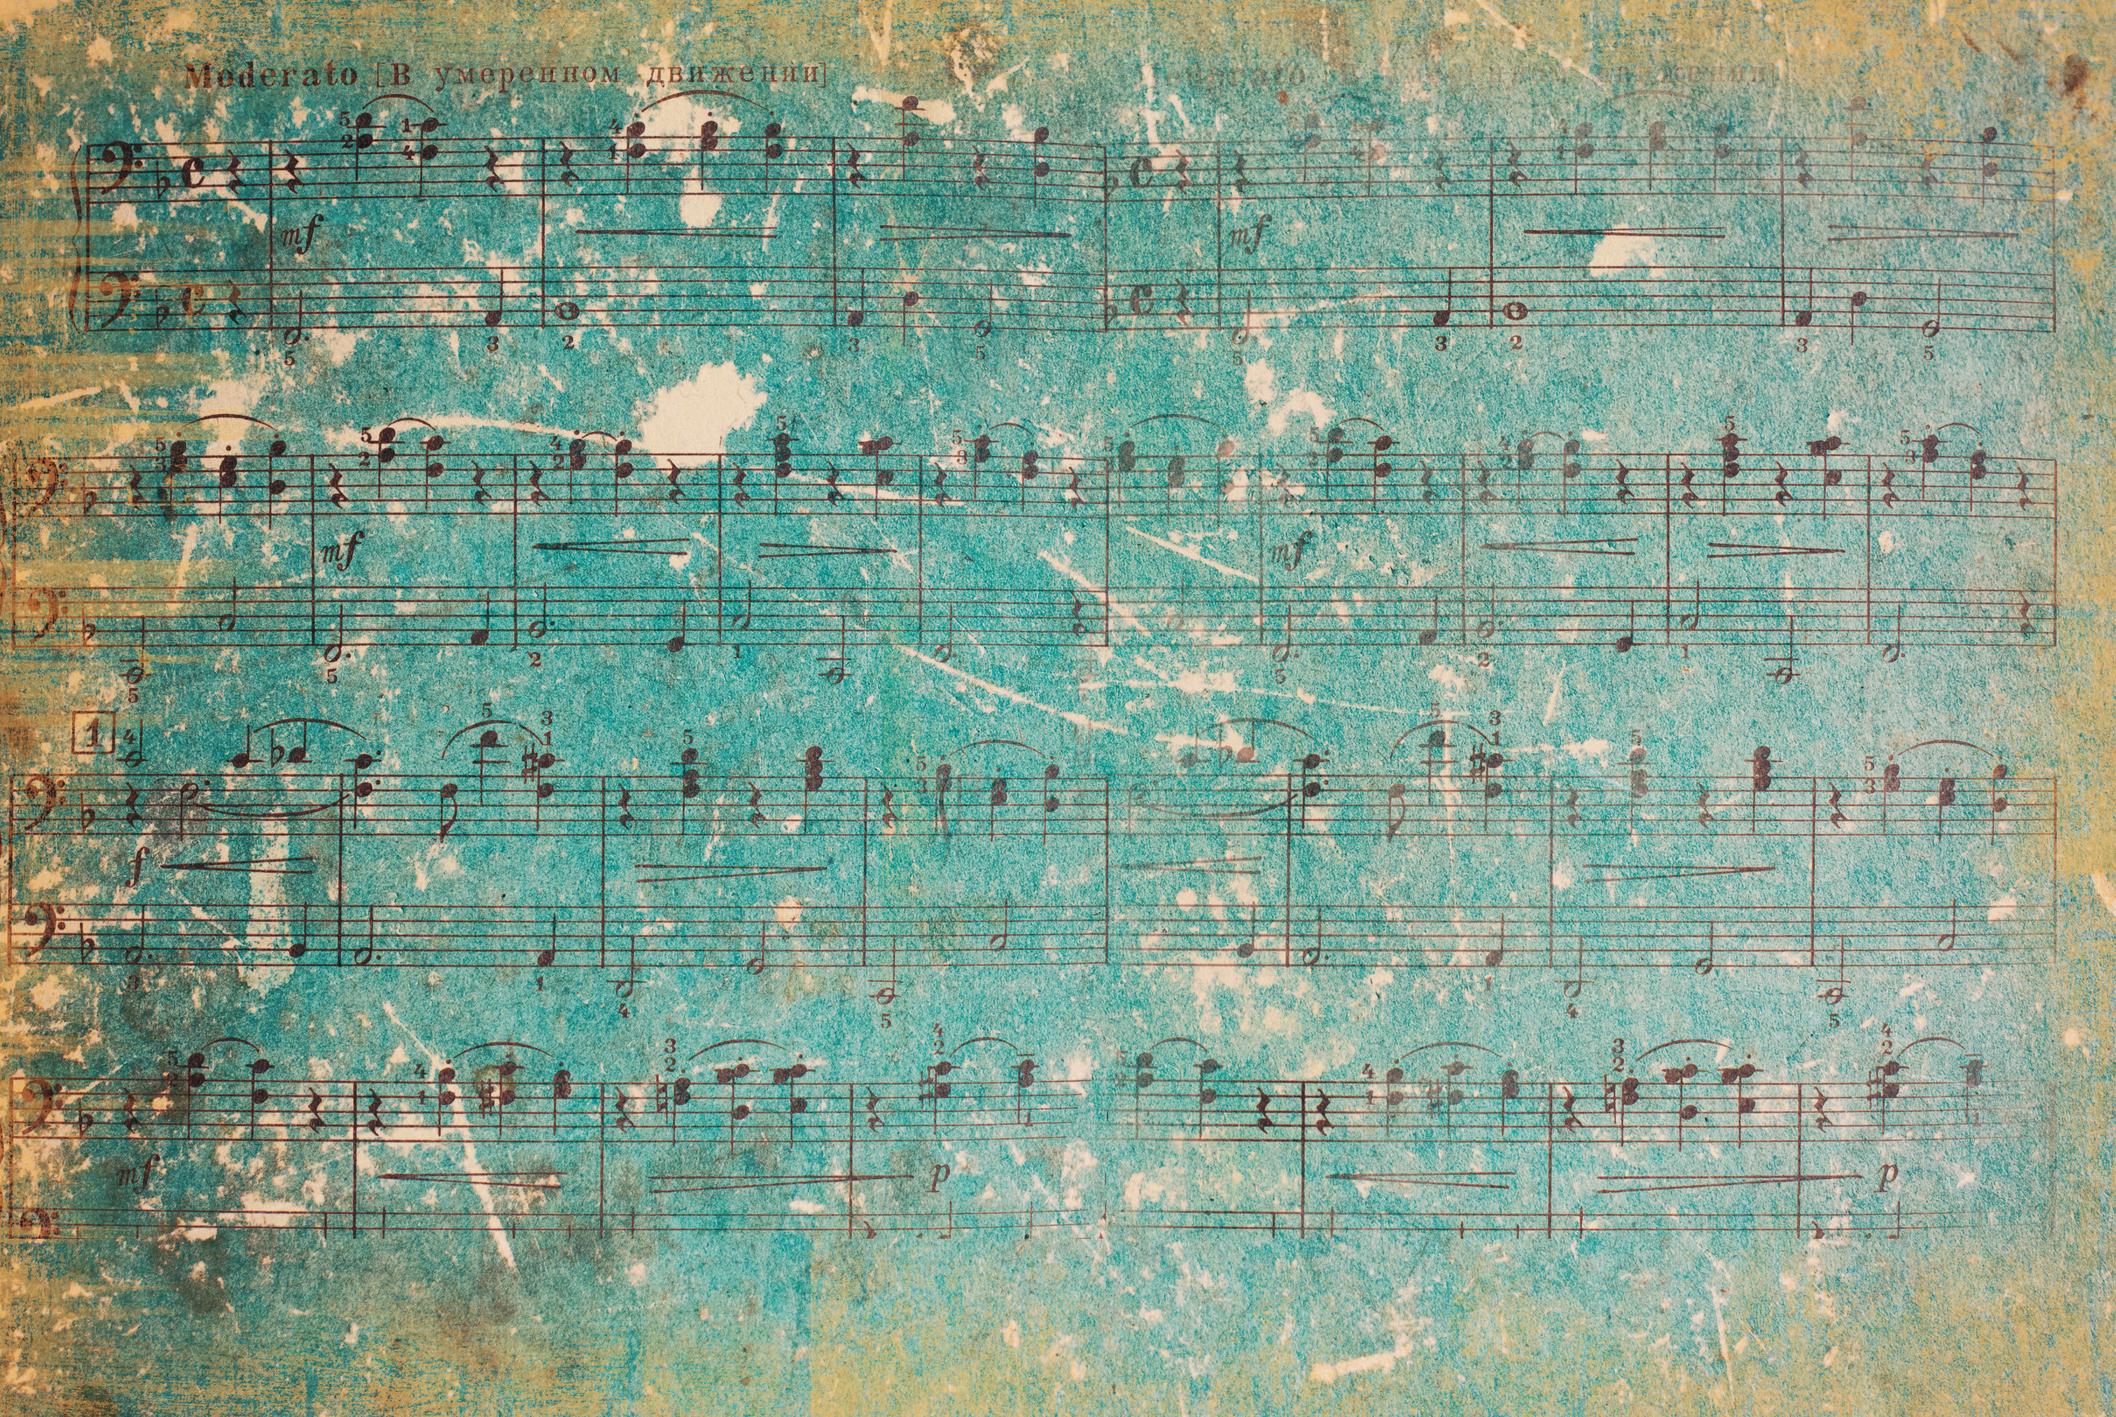 Music and Mathematics - Grade 11